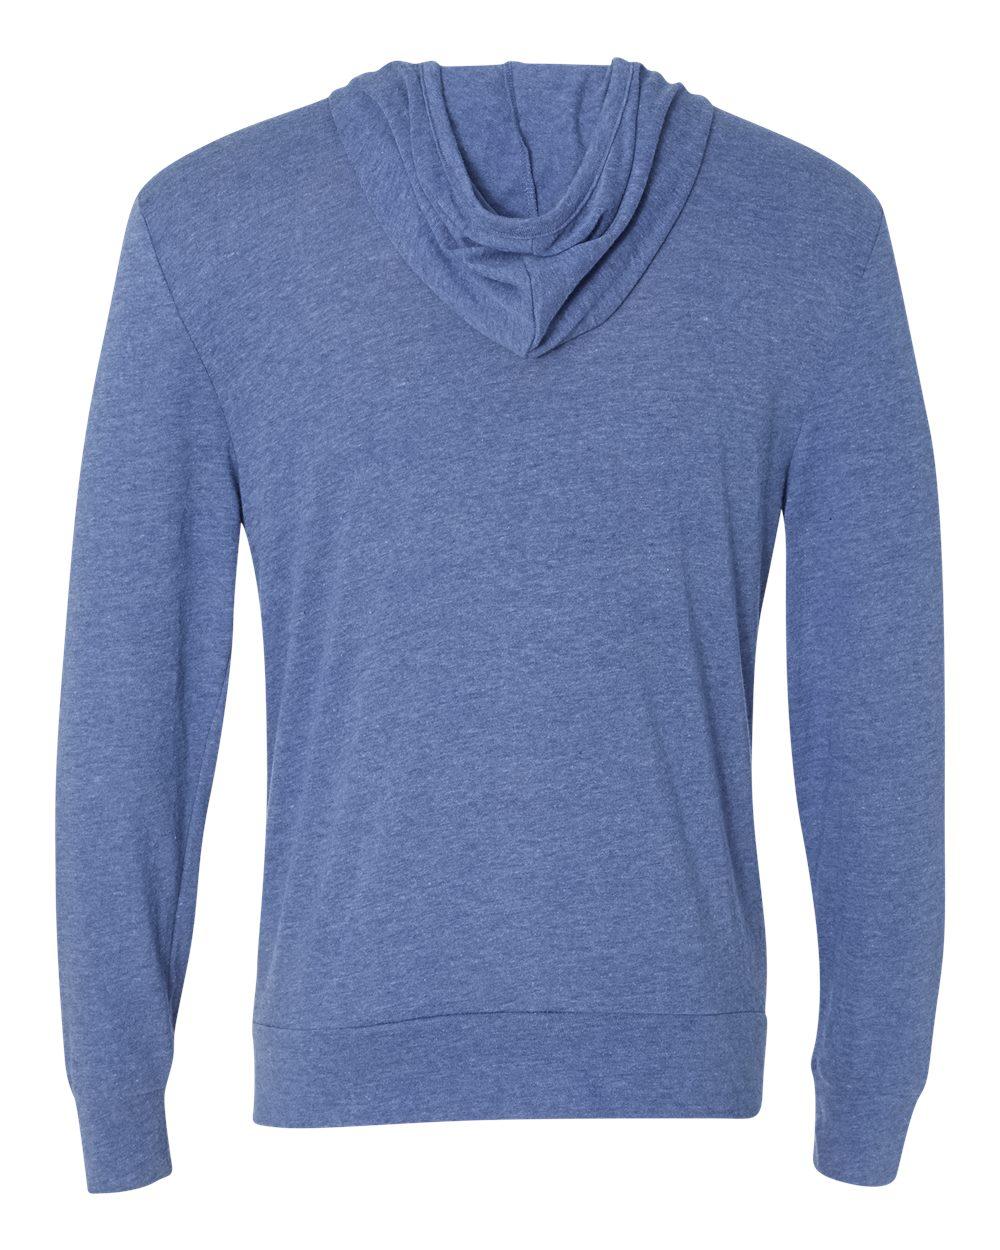 Alternative-Mens-Eco-Jersey-Hooded-Full-Zip-T-Shirt-Blank-Plain-1970e1-up-to-3XL miniature 13